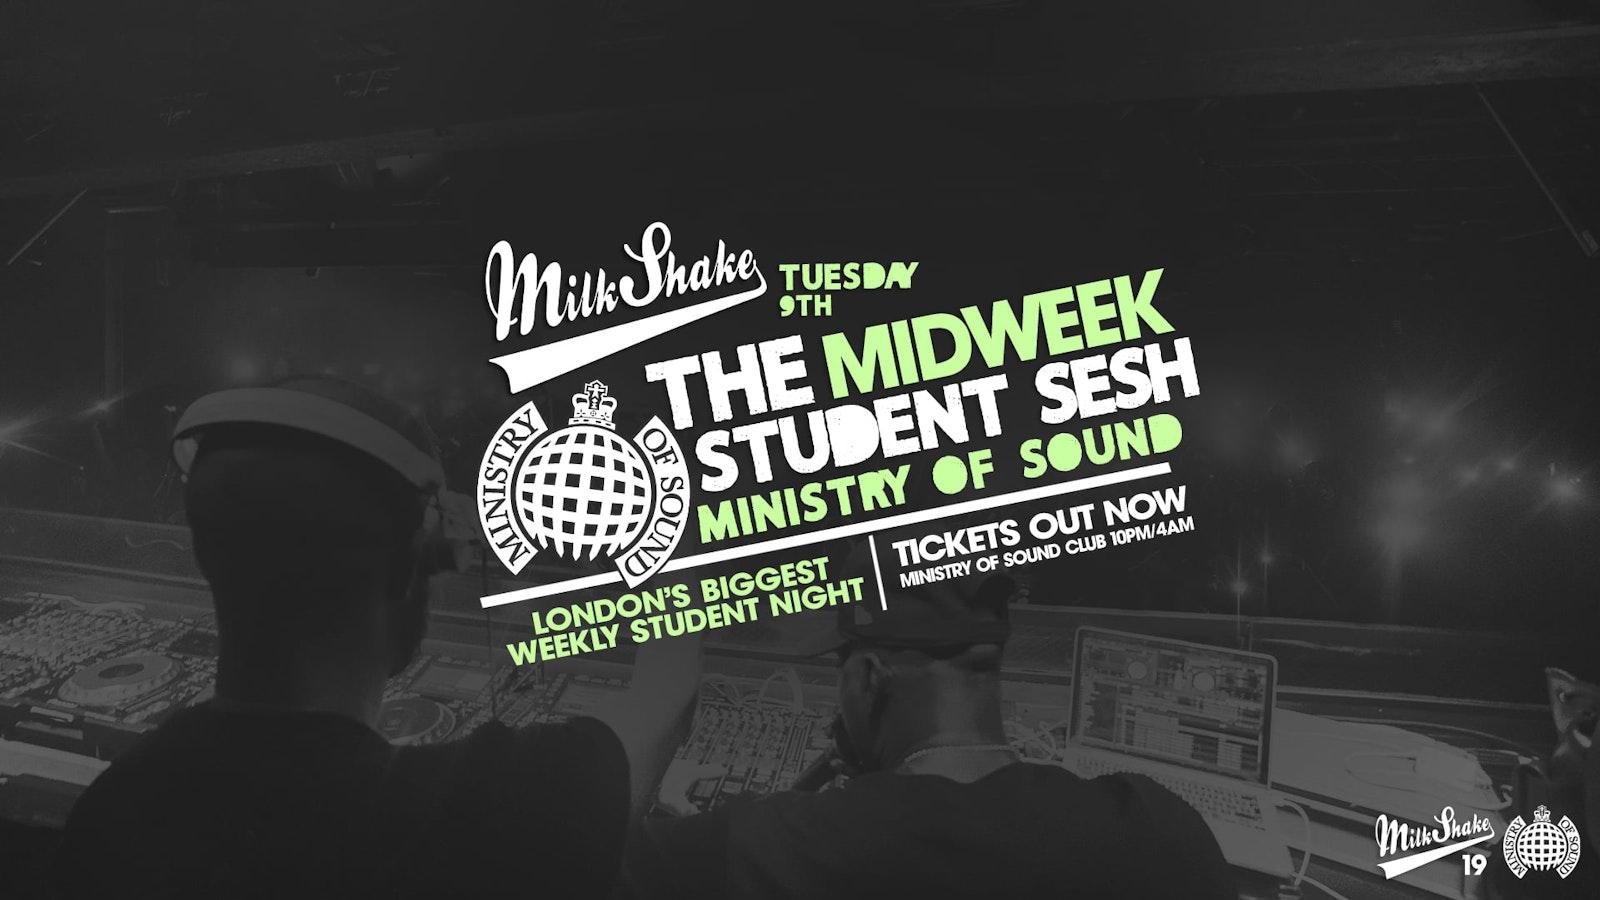 Milkshake, Ministry of Sound | London's Biggest Student Night – November 9th 2021 🔥